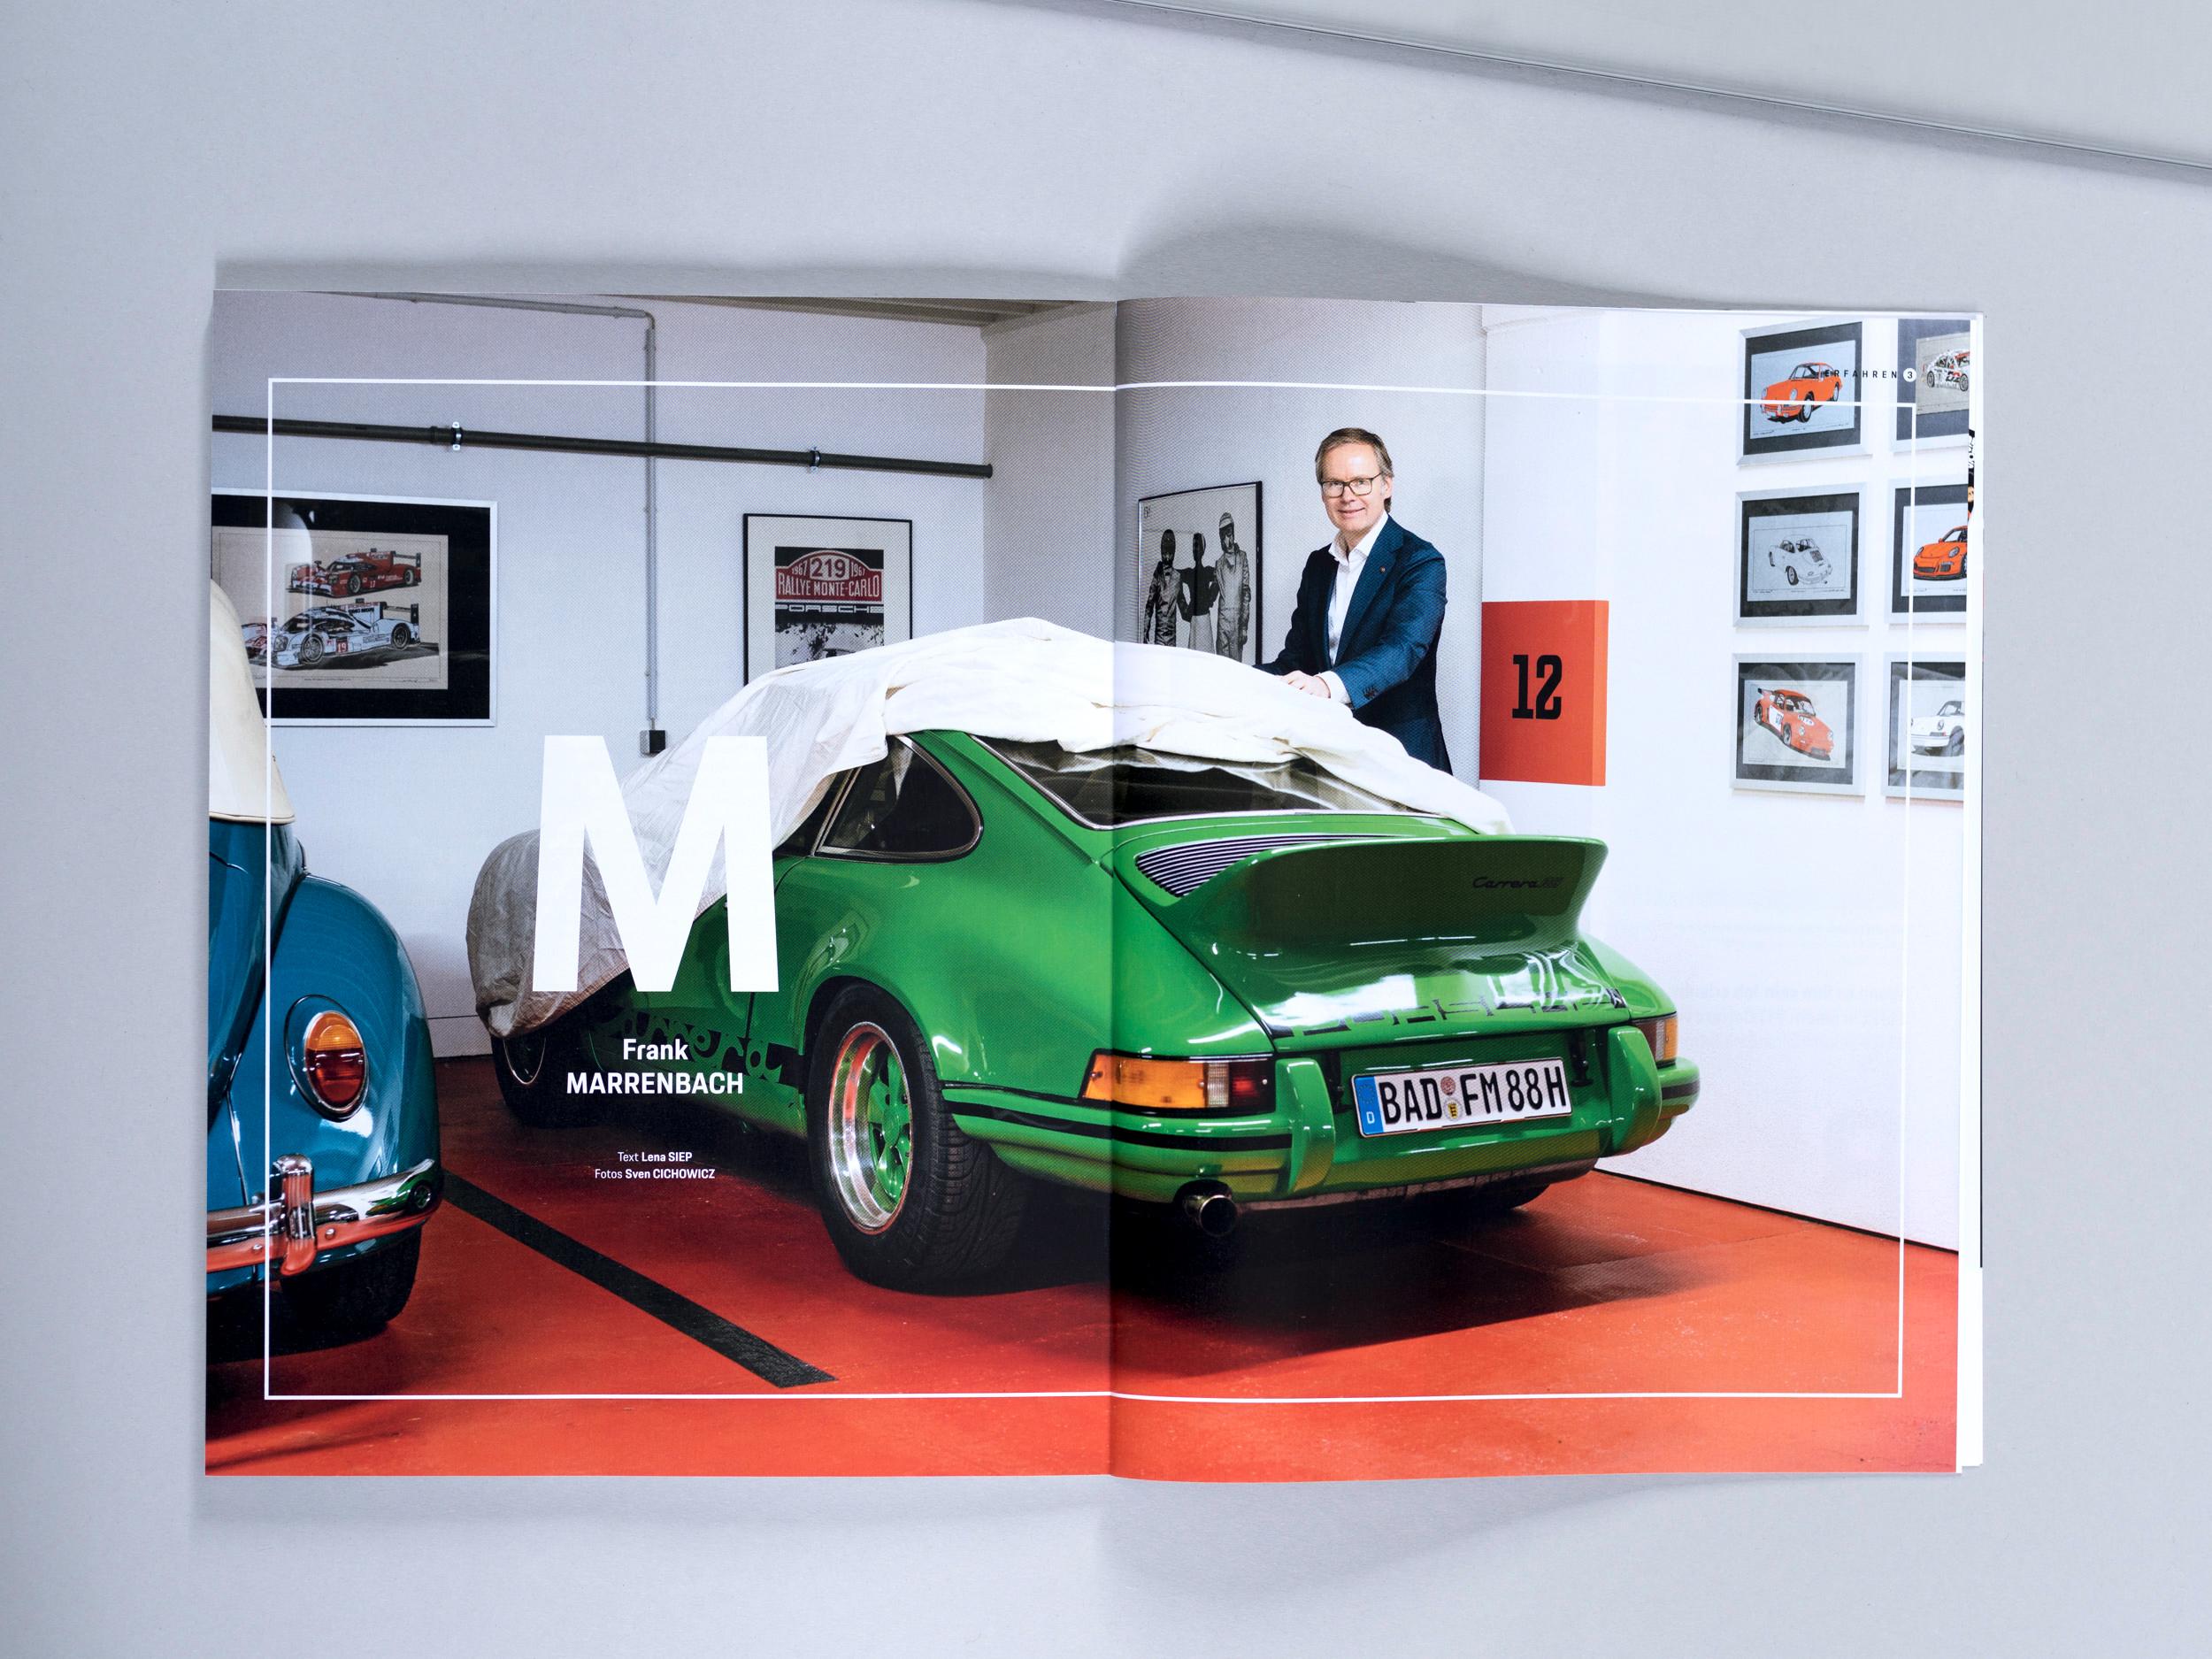 Frank Marrenbach, director Oetker Collection Hotels, Baden-Baden